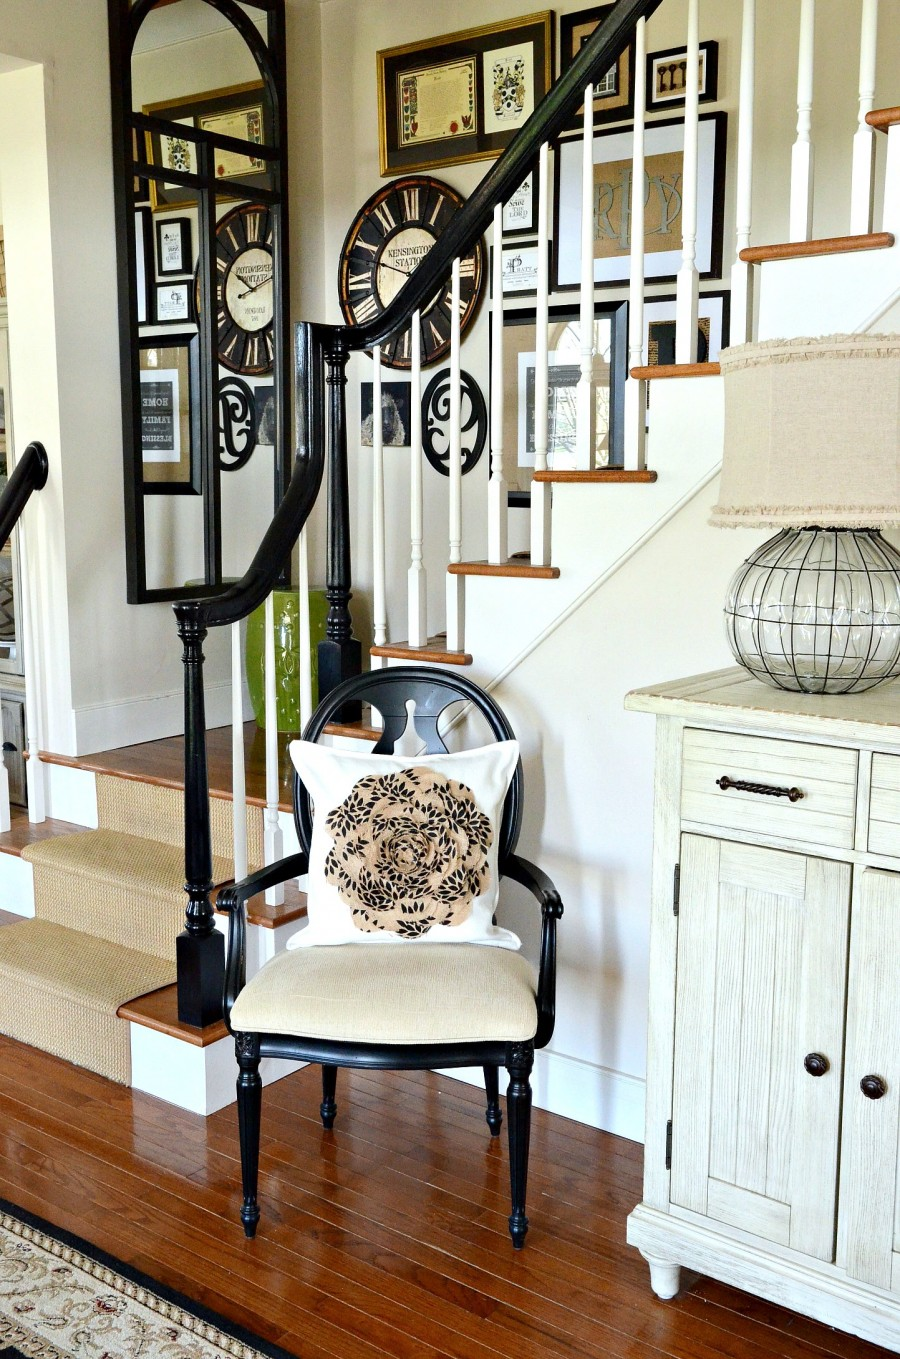 Decor Steals -Clock on the stairs-stonegableblog.com